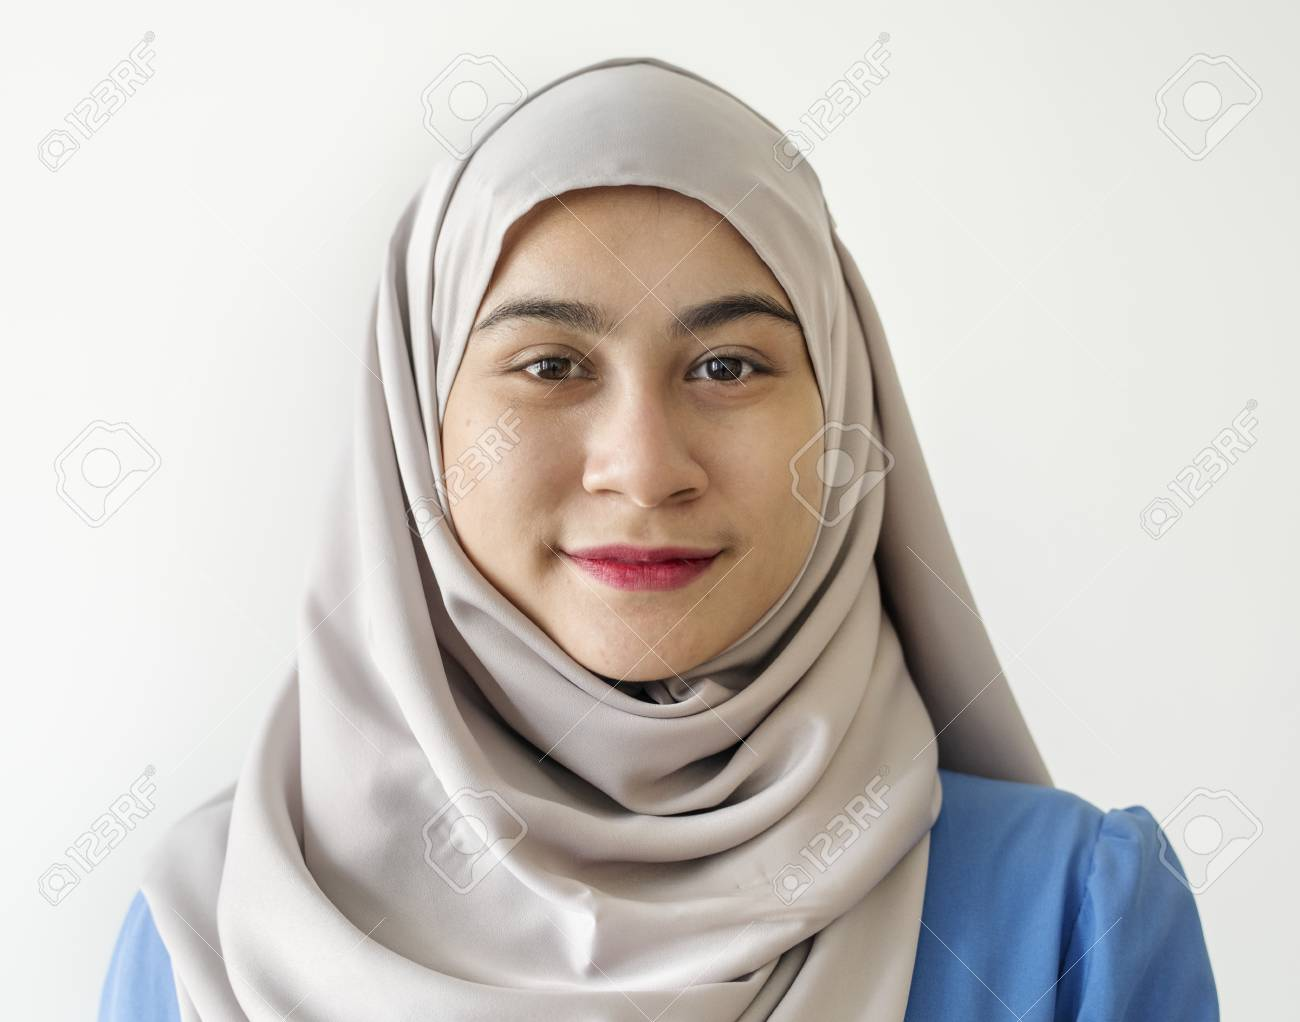 Portrait of a Muslim woman - 102861410